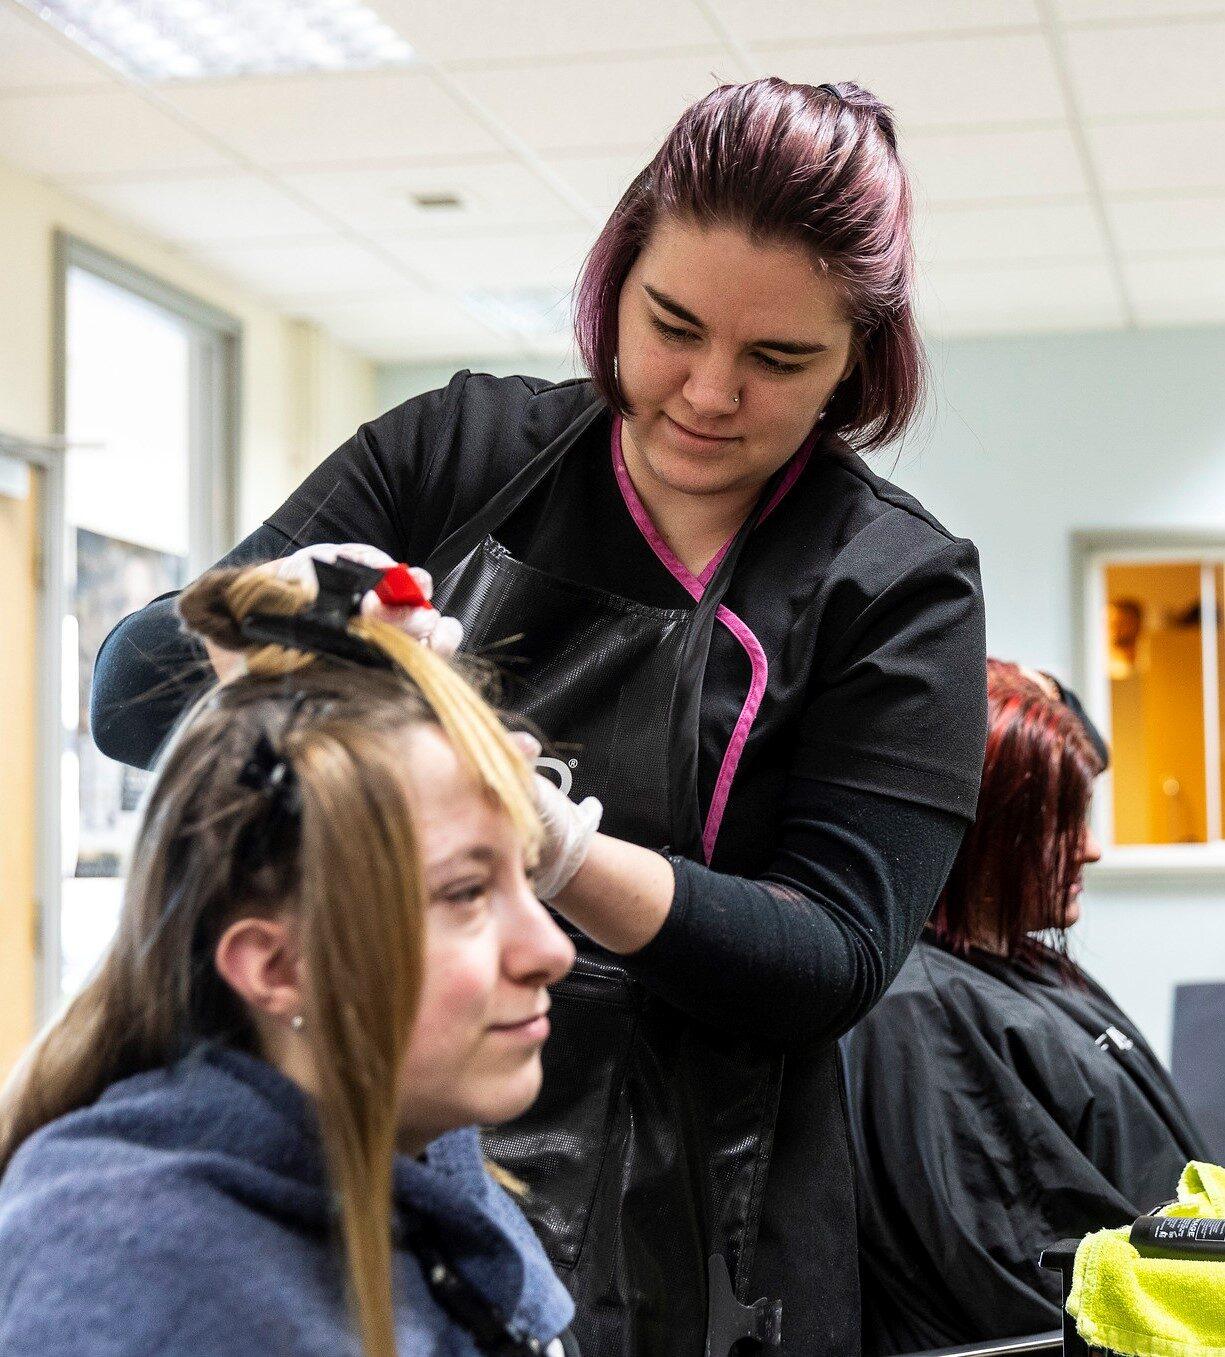 Tresham College Hairdressing Level 3